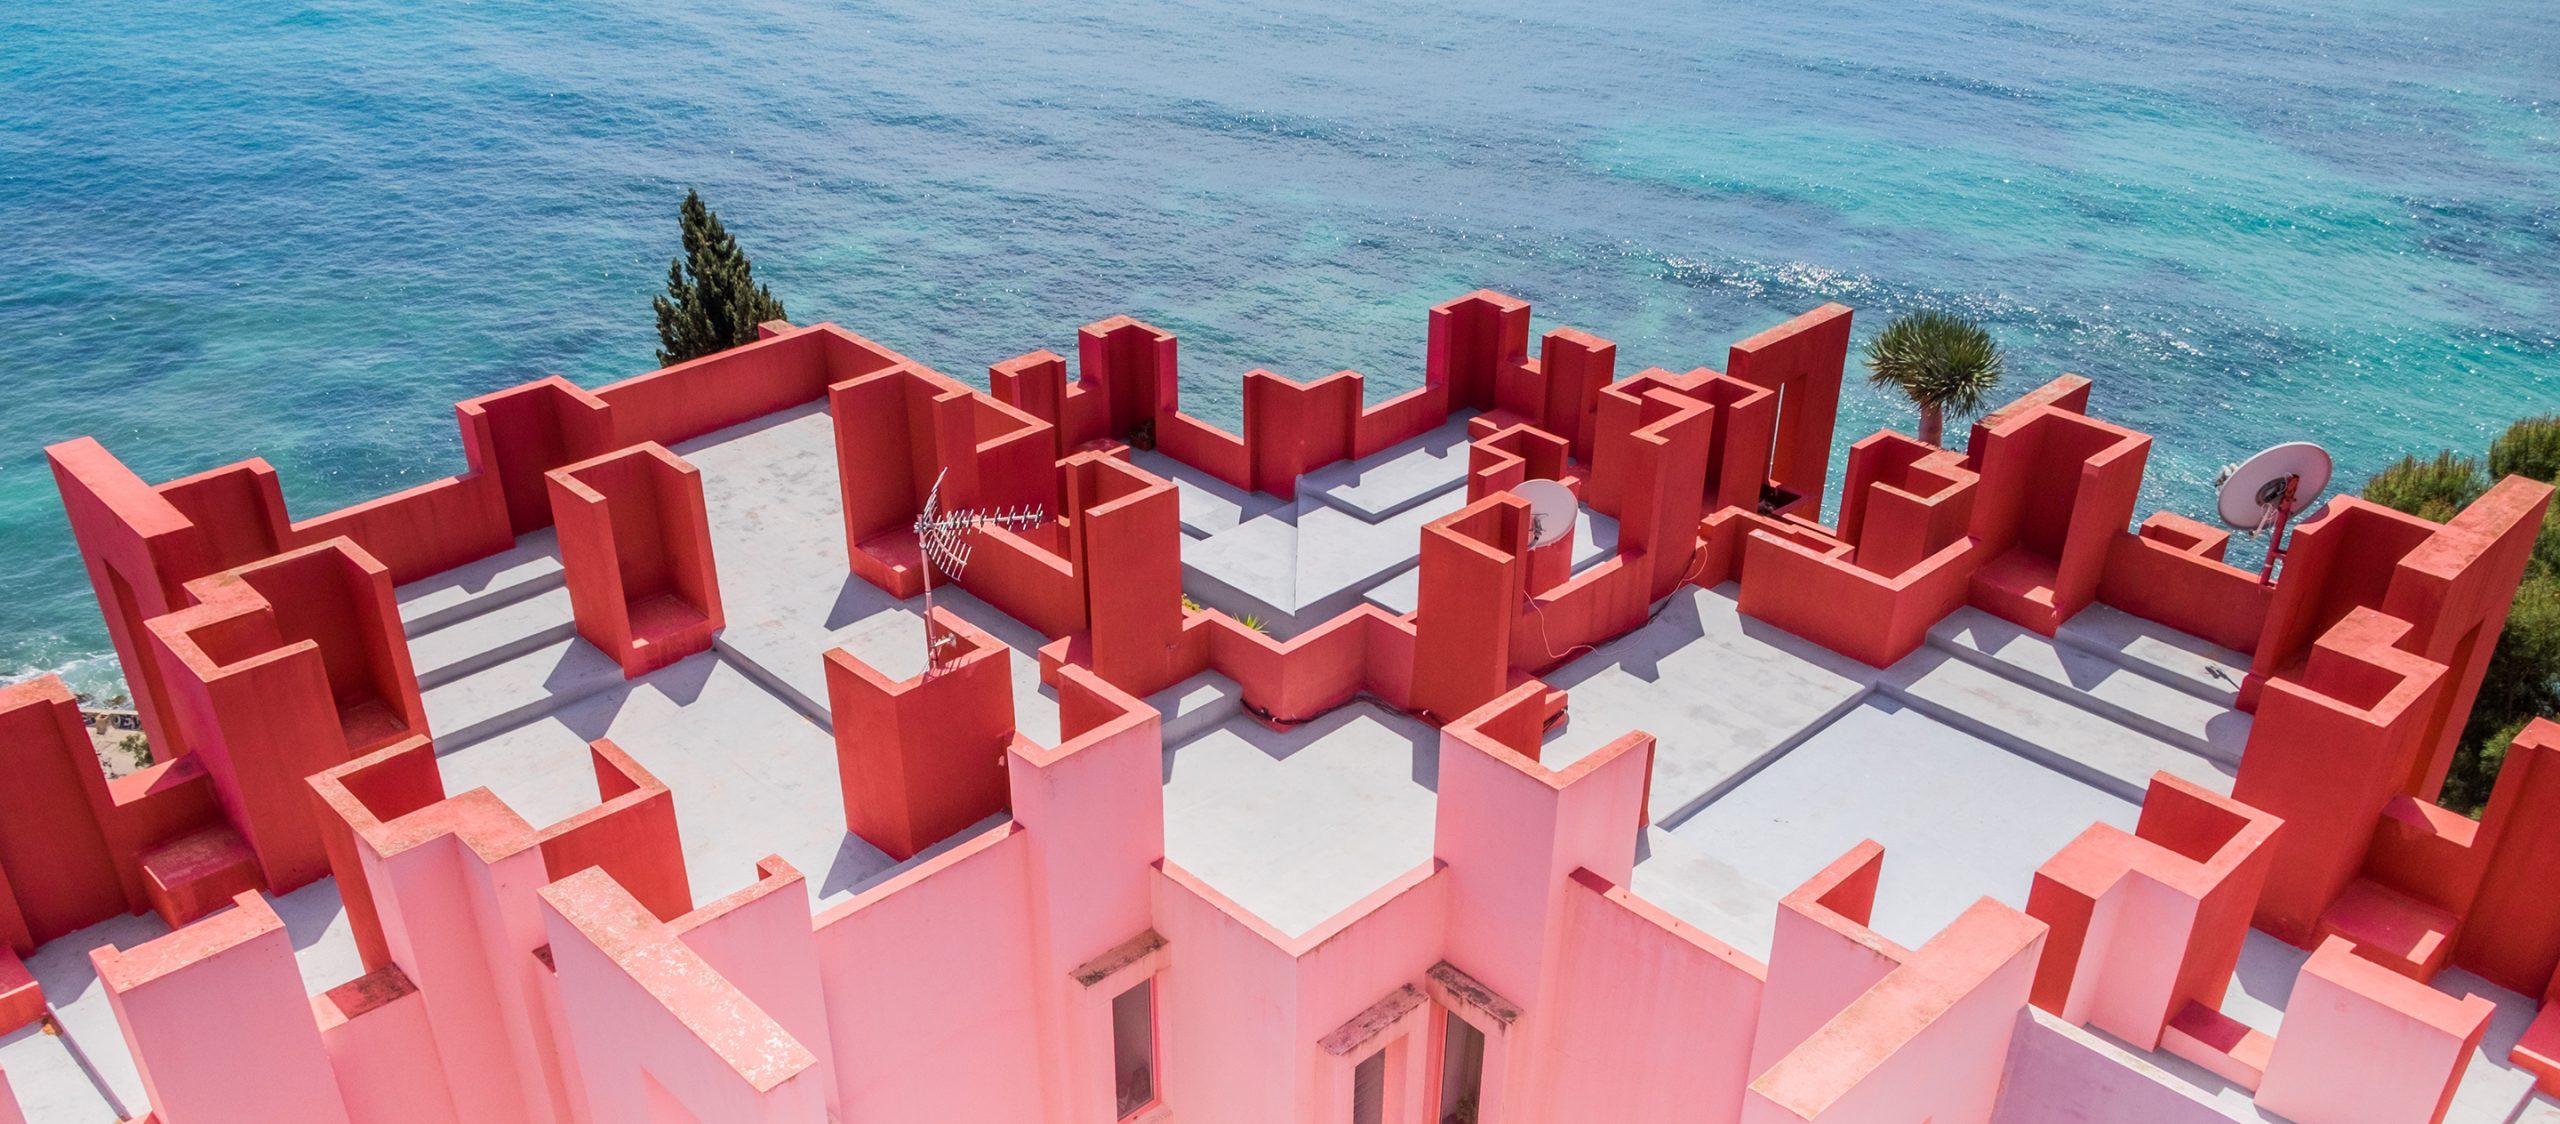 La Muralla Roja ที่พักตากอากาศสีพาสเทลริมทะเลเมดิเตอร์เรเนียนที่สวยและสงบมาก